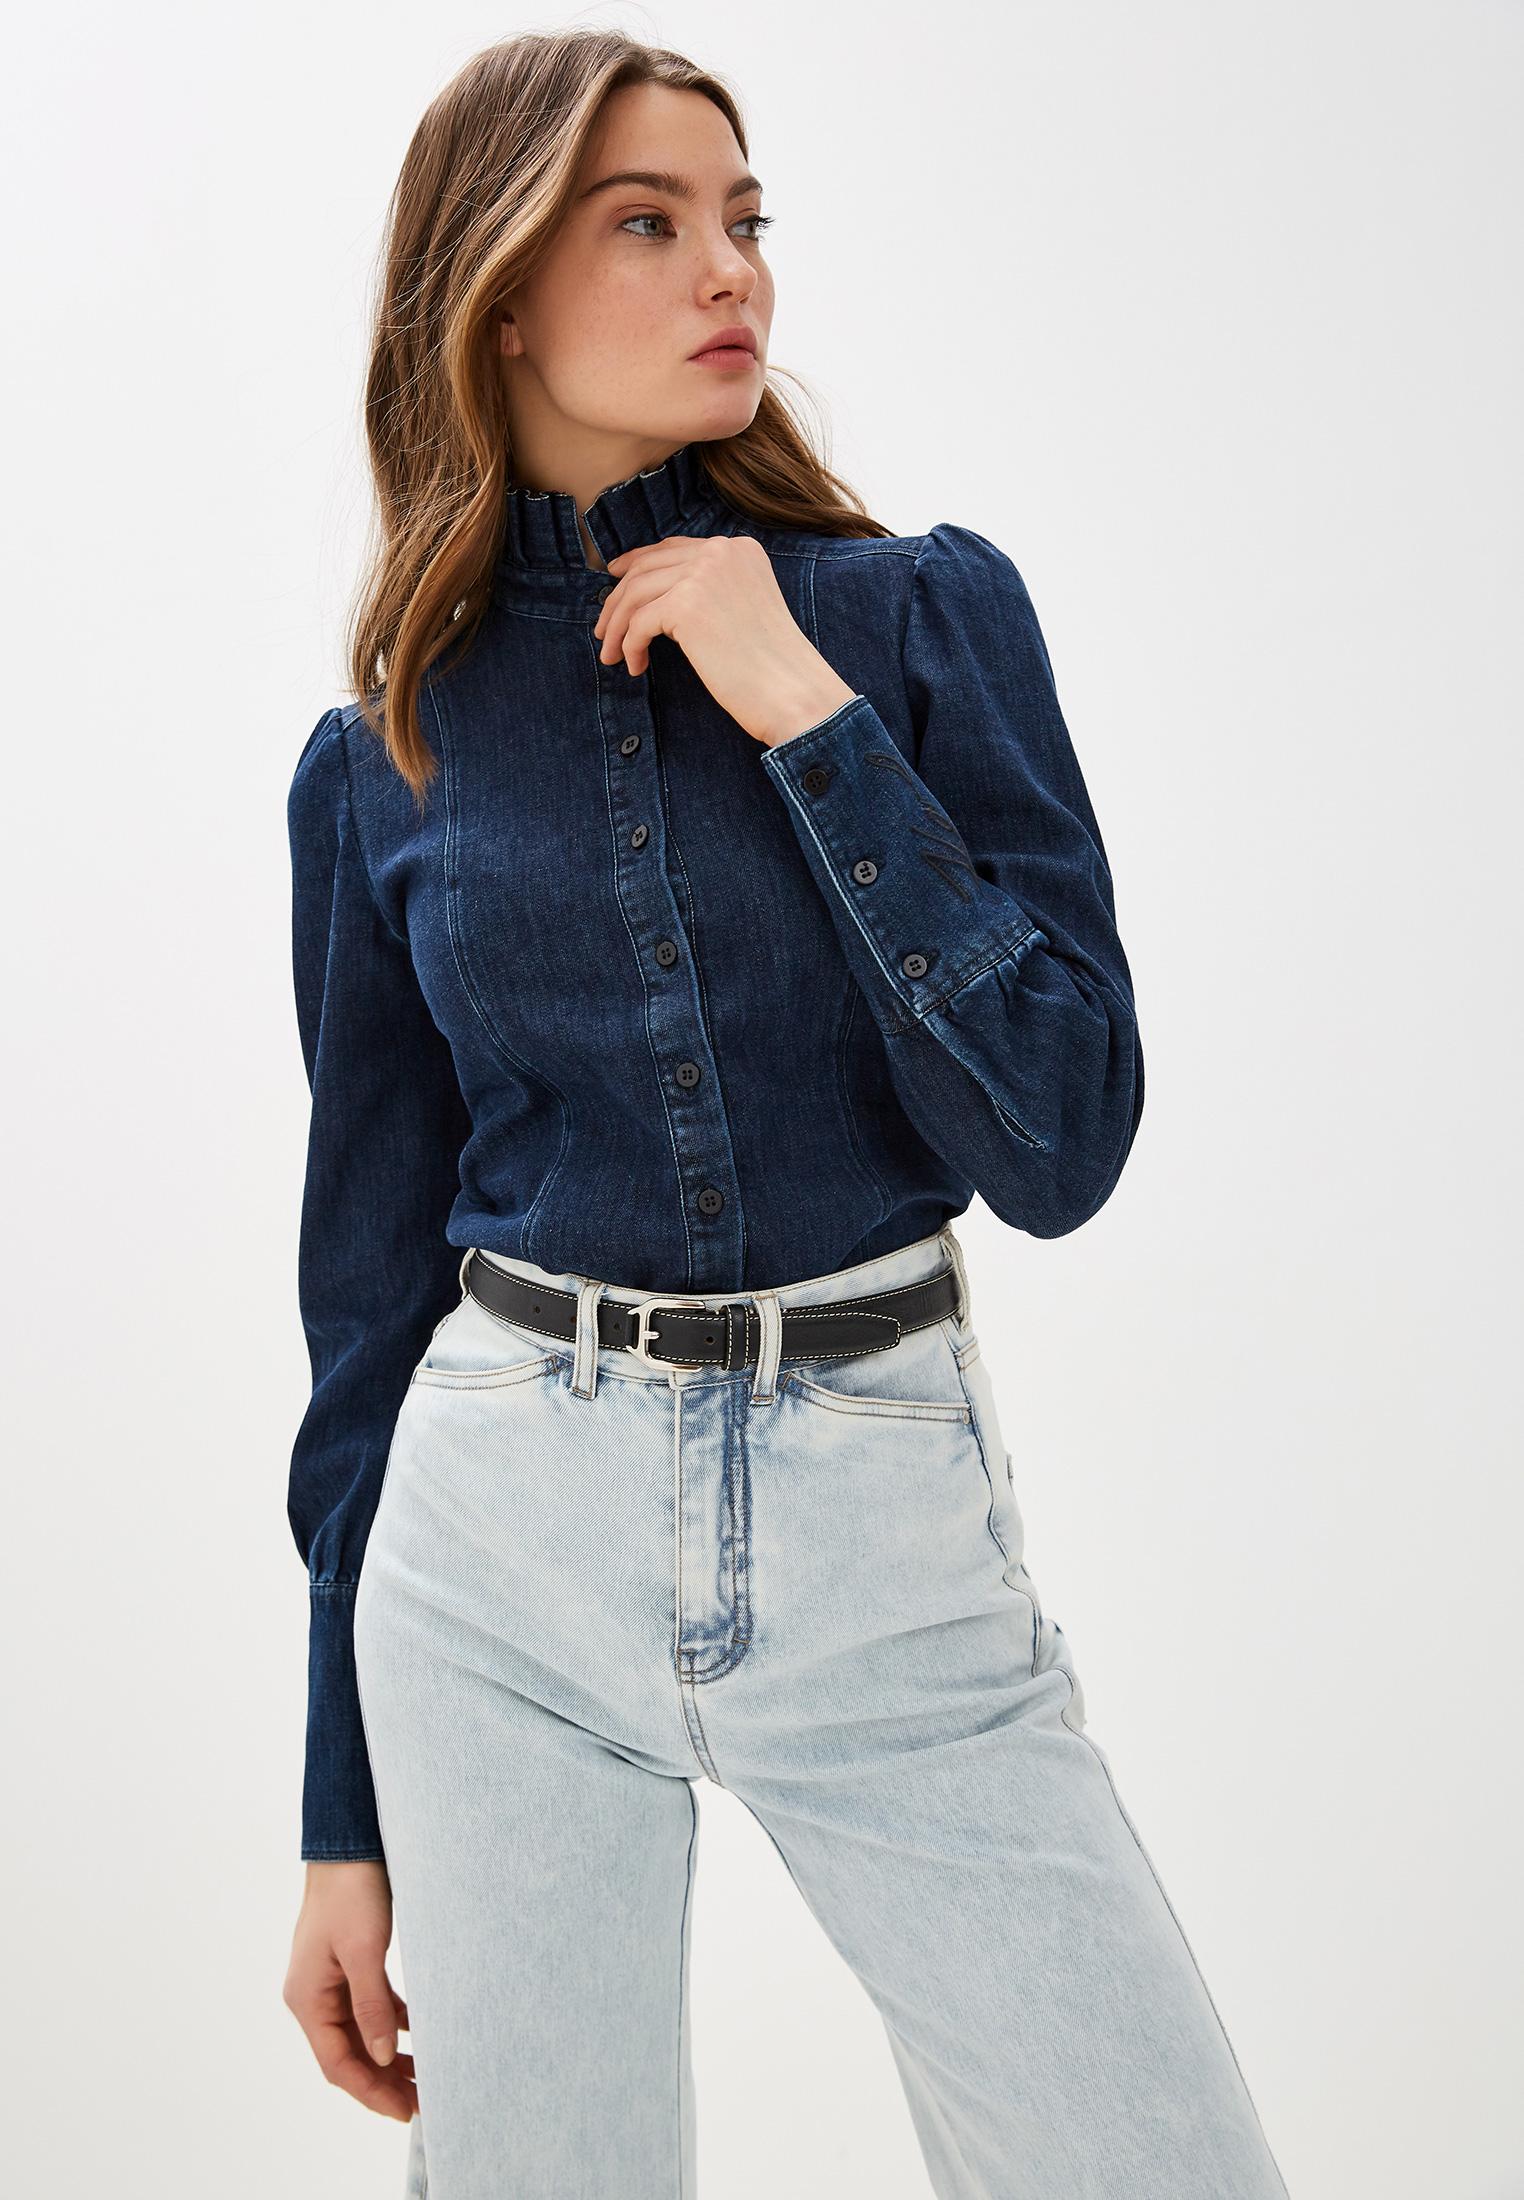 . Dorothy Perkins CURVA Women/'s Boyfriend jeans slim neri nero 130